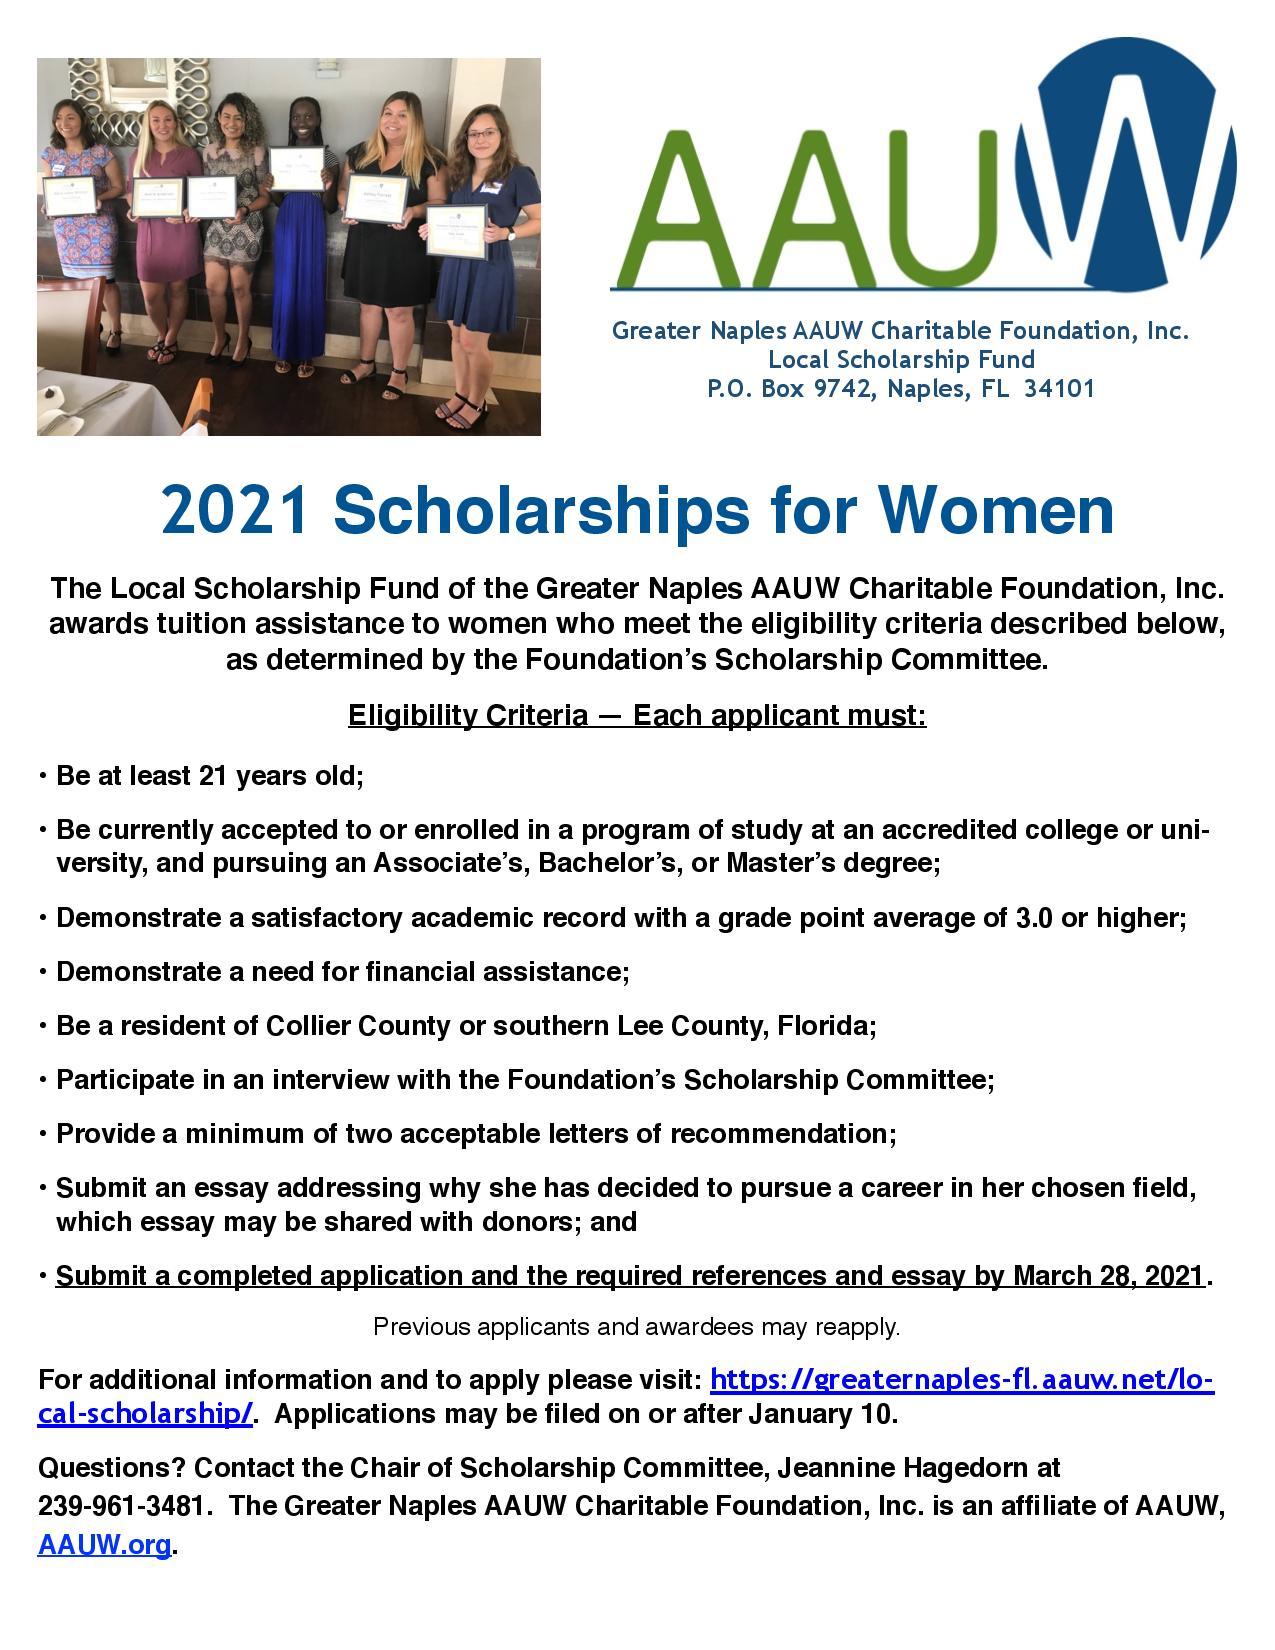 2021 Local Scholarship